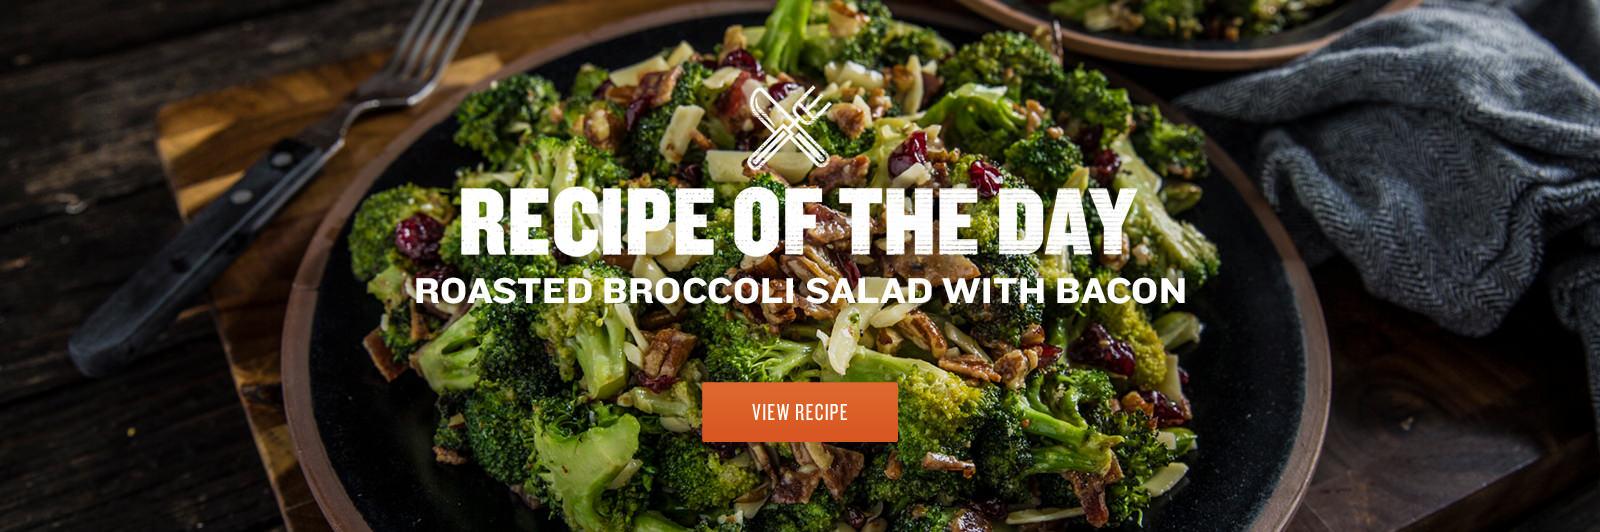 Roasted Broccoli Salad with Bacon